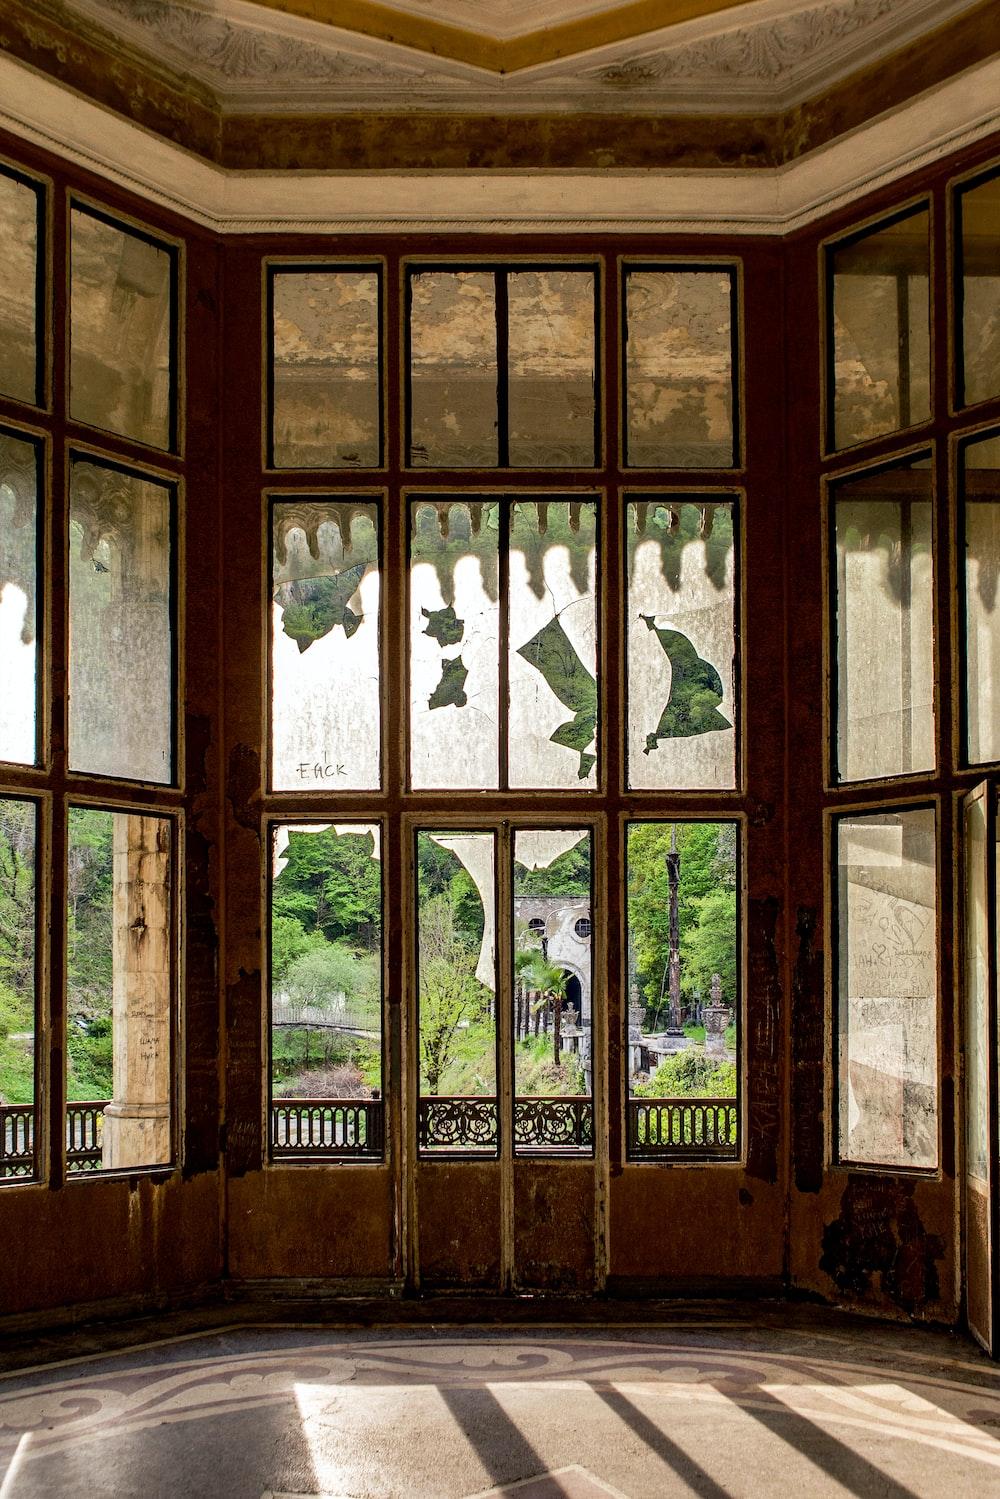 Brown Wooden Framed Glass Window Photo Free Window Image On Unsplash